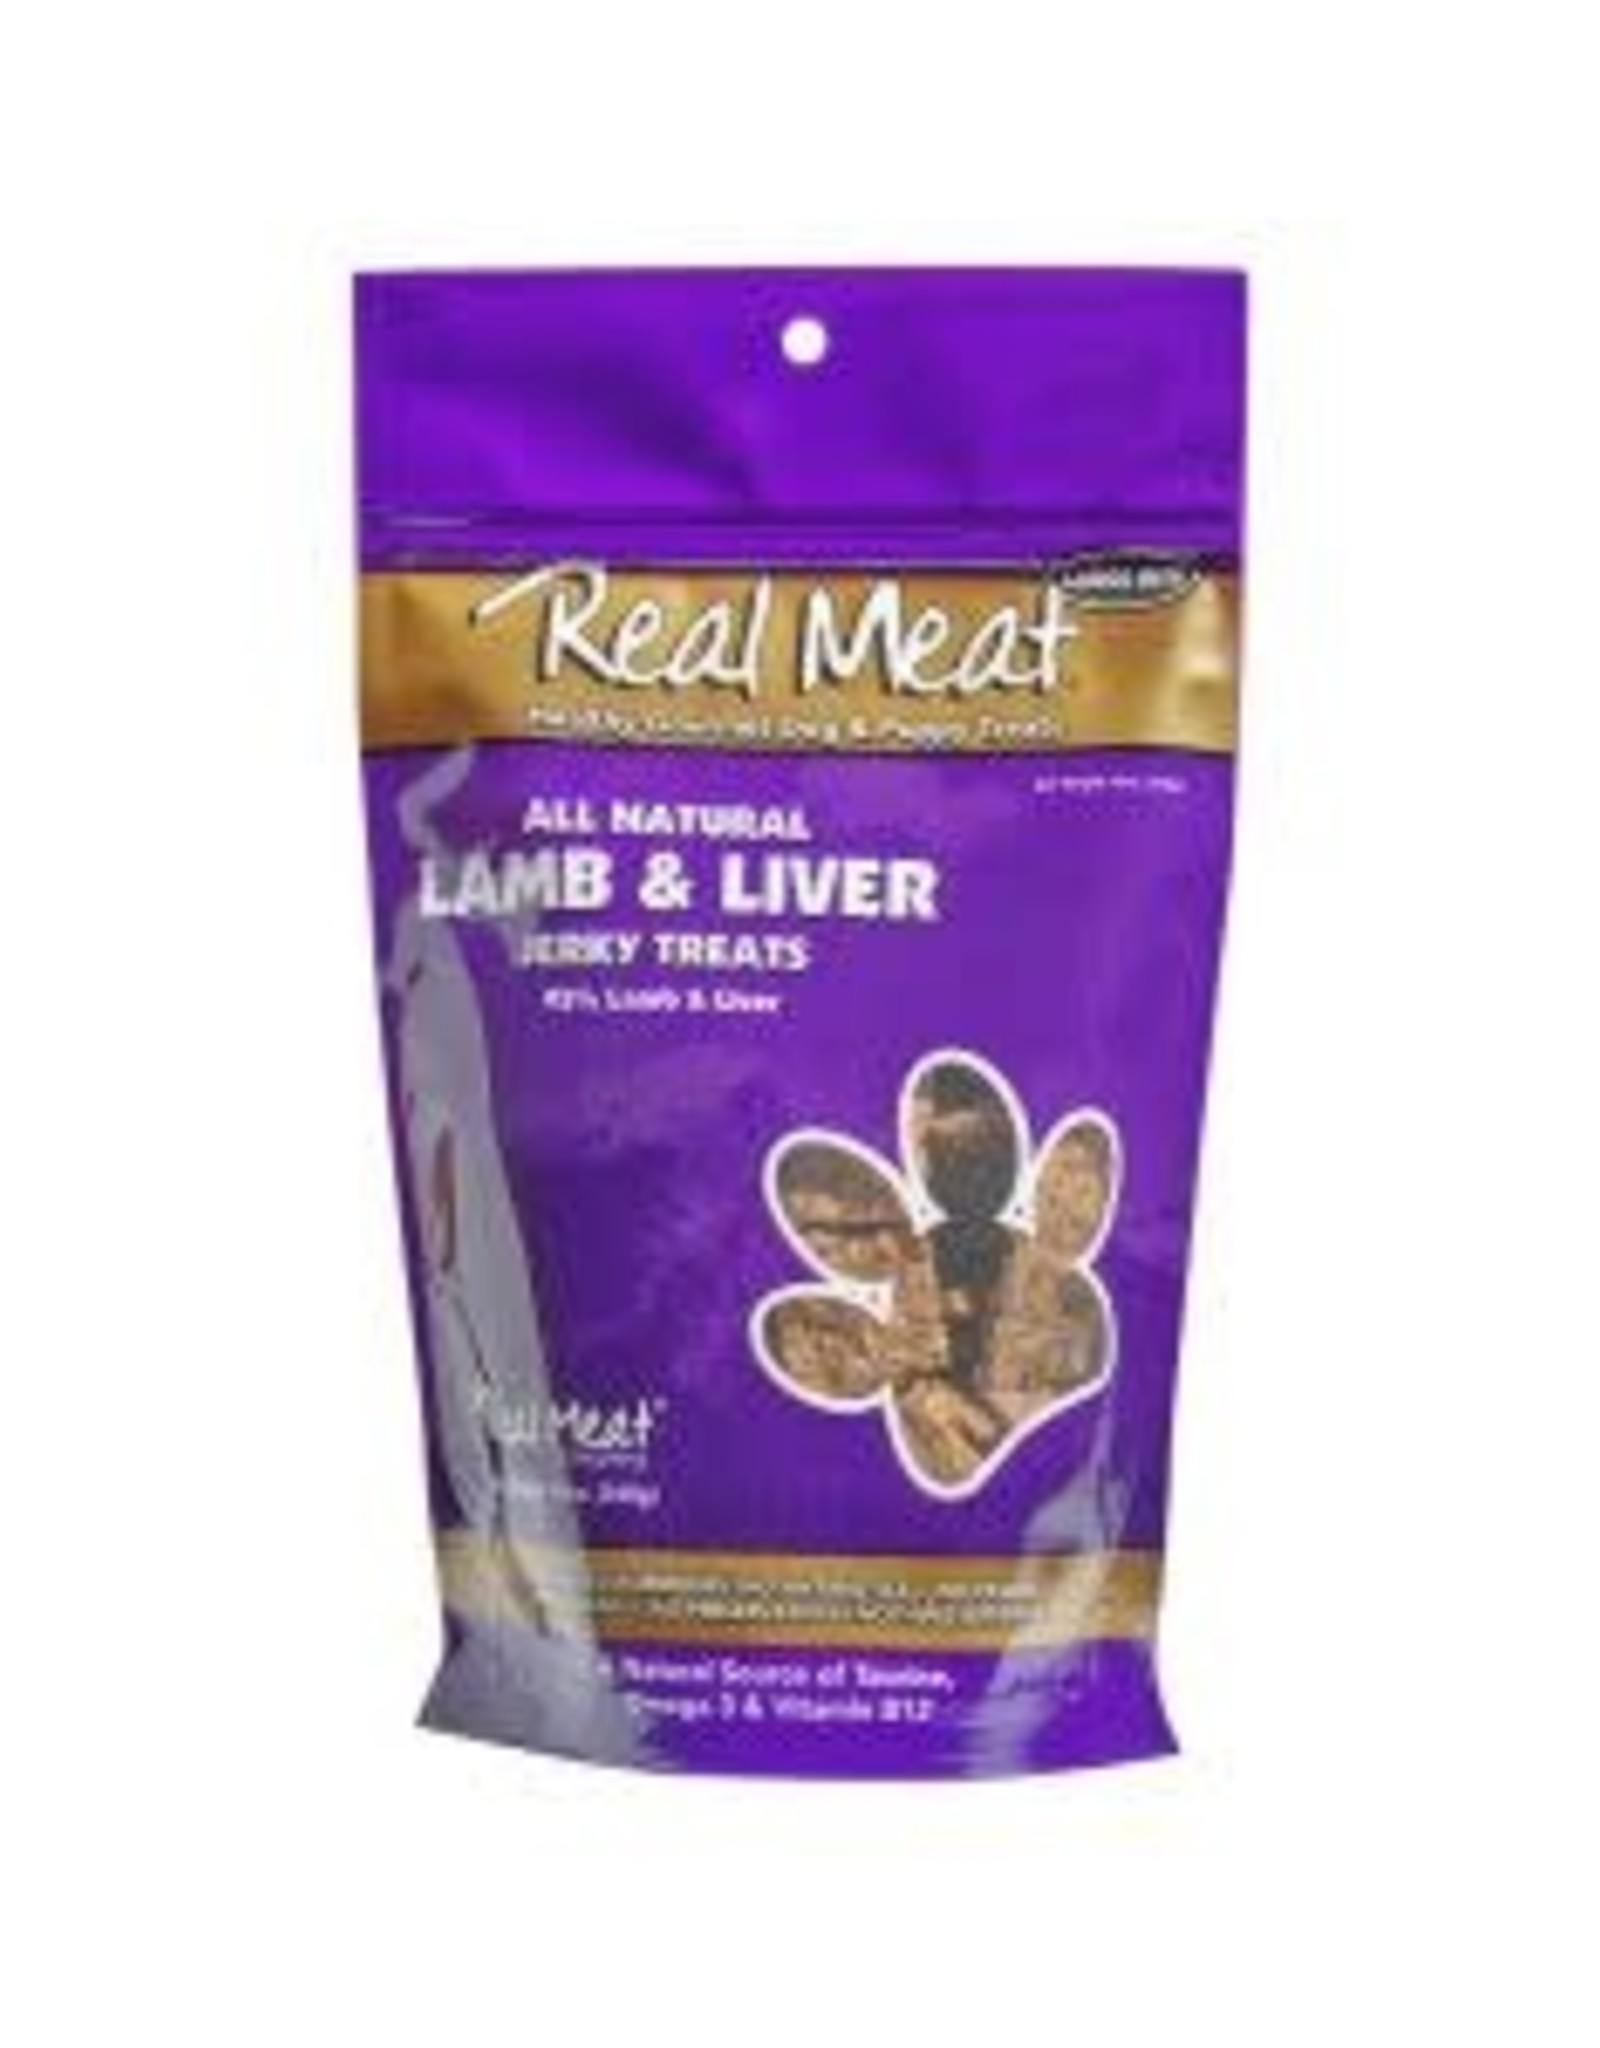 The Real Meat Company Real Meat Jerky Treats: Lamb & Liver